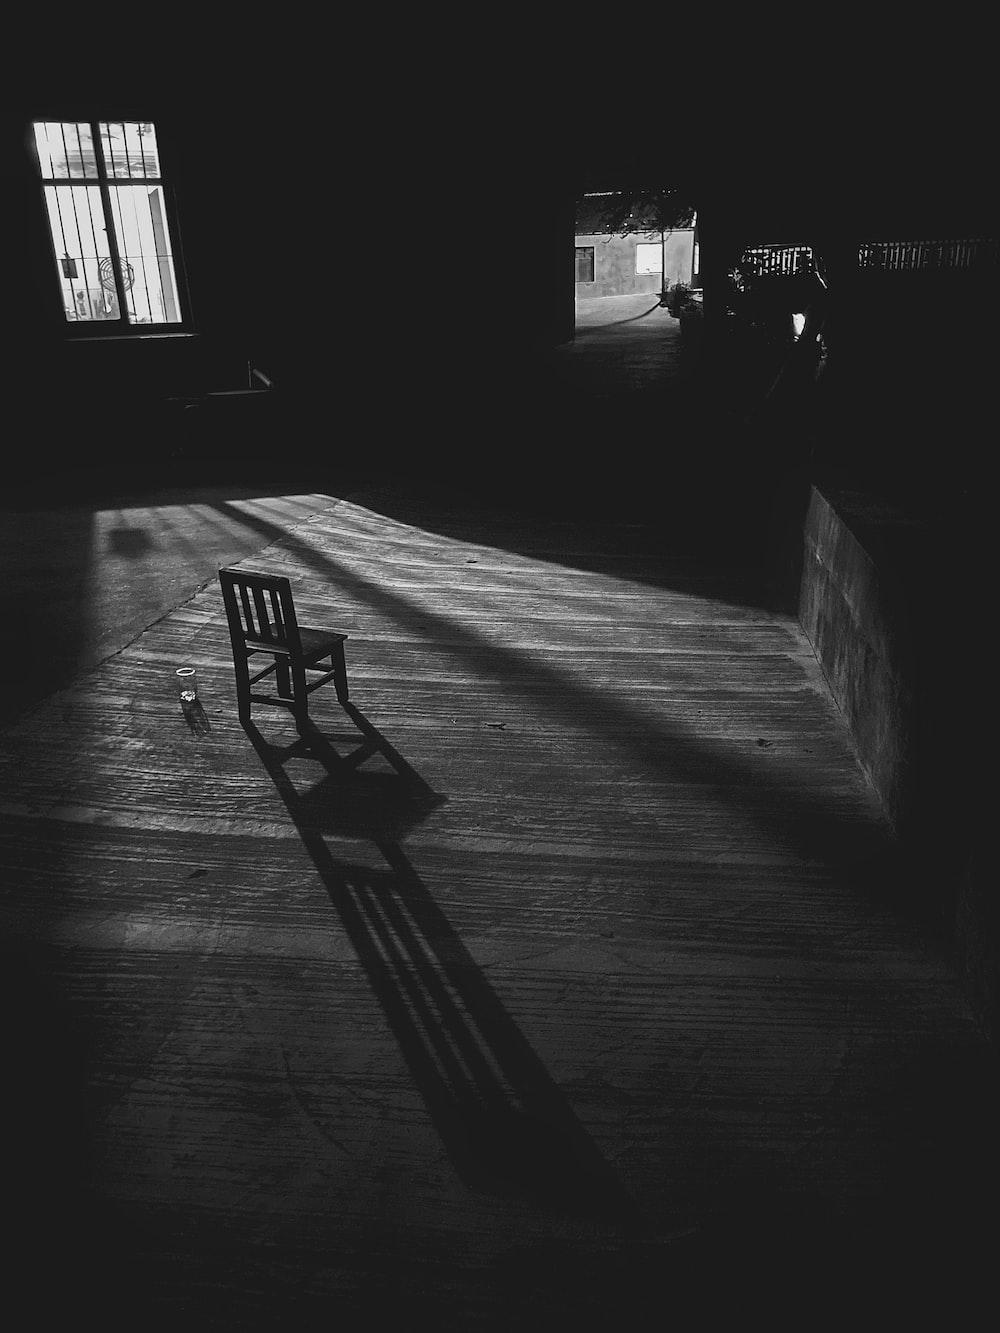 black chair on gray concrete floor